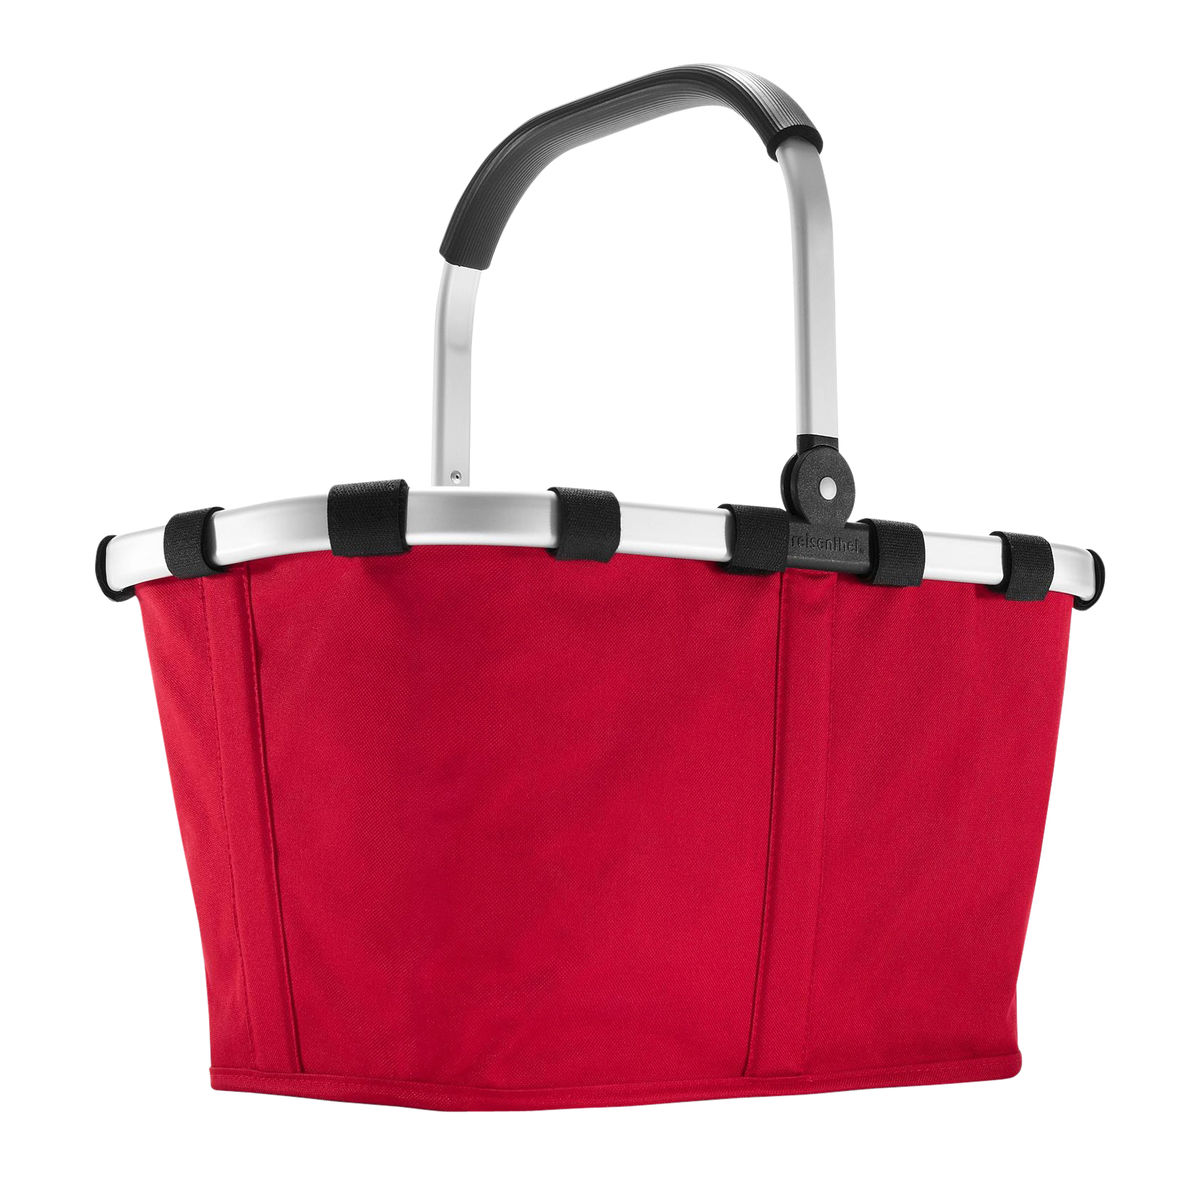 reisenthel carrybag shopping bag reisenthel bags baskets baskets storage accessories. Black Bedroom Furniture Sets. Home Design Ideas